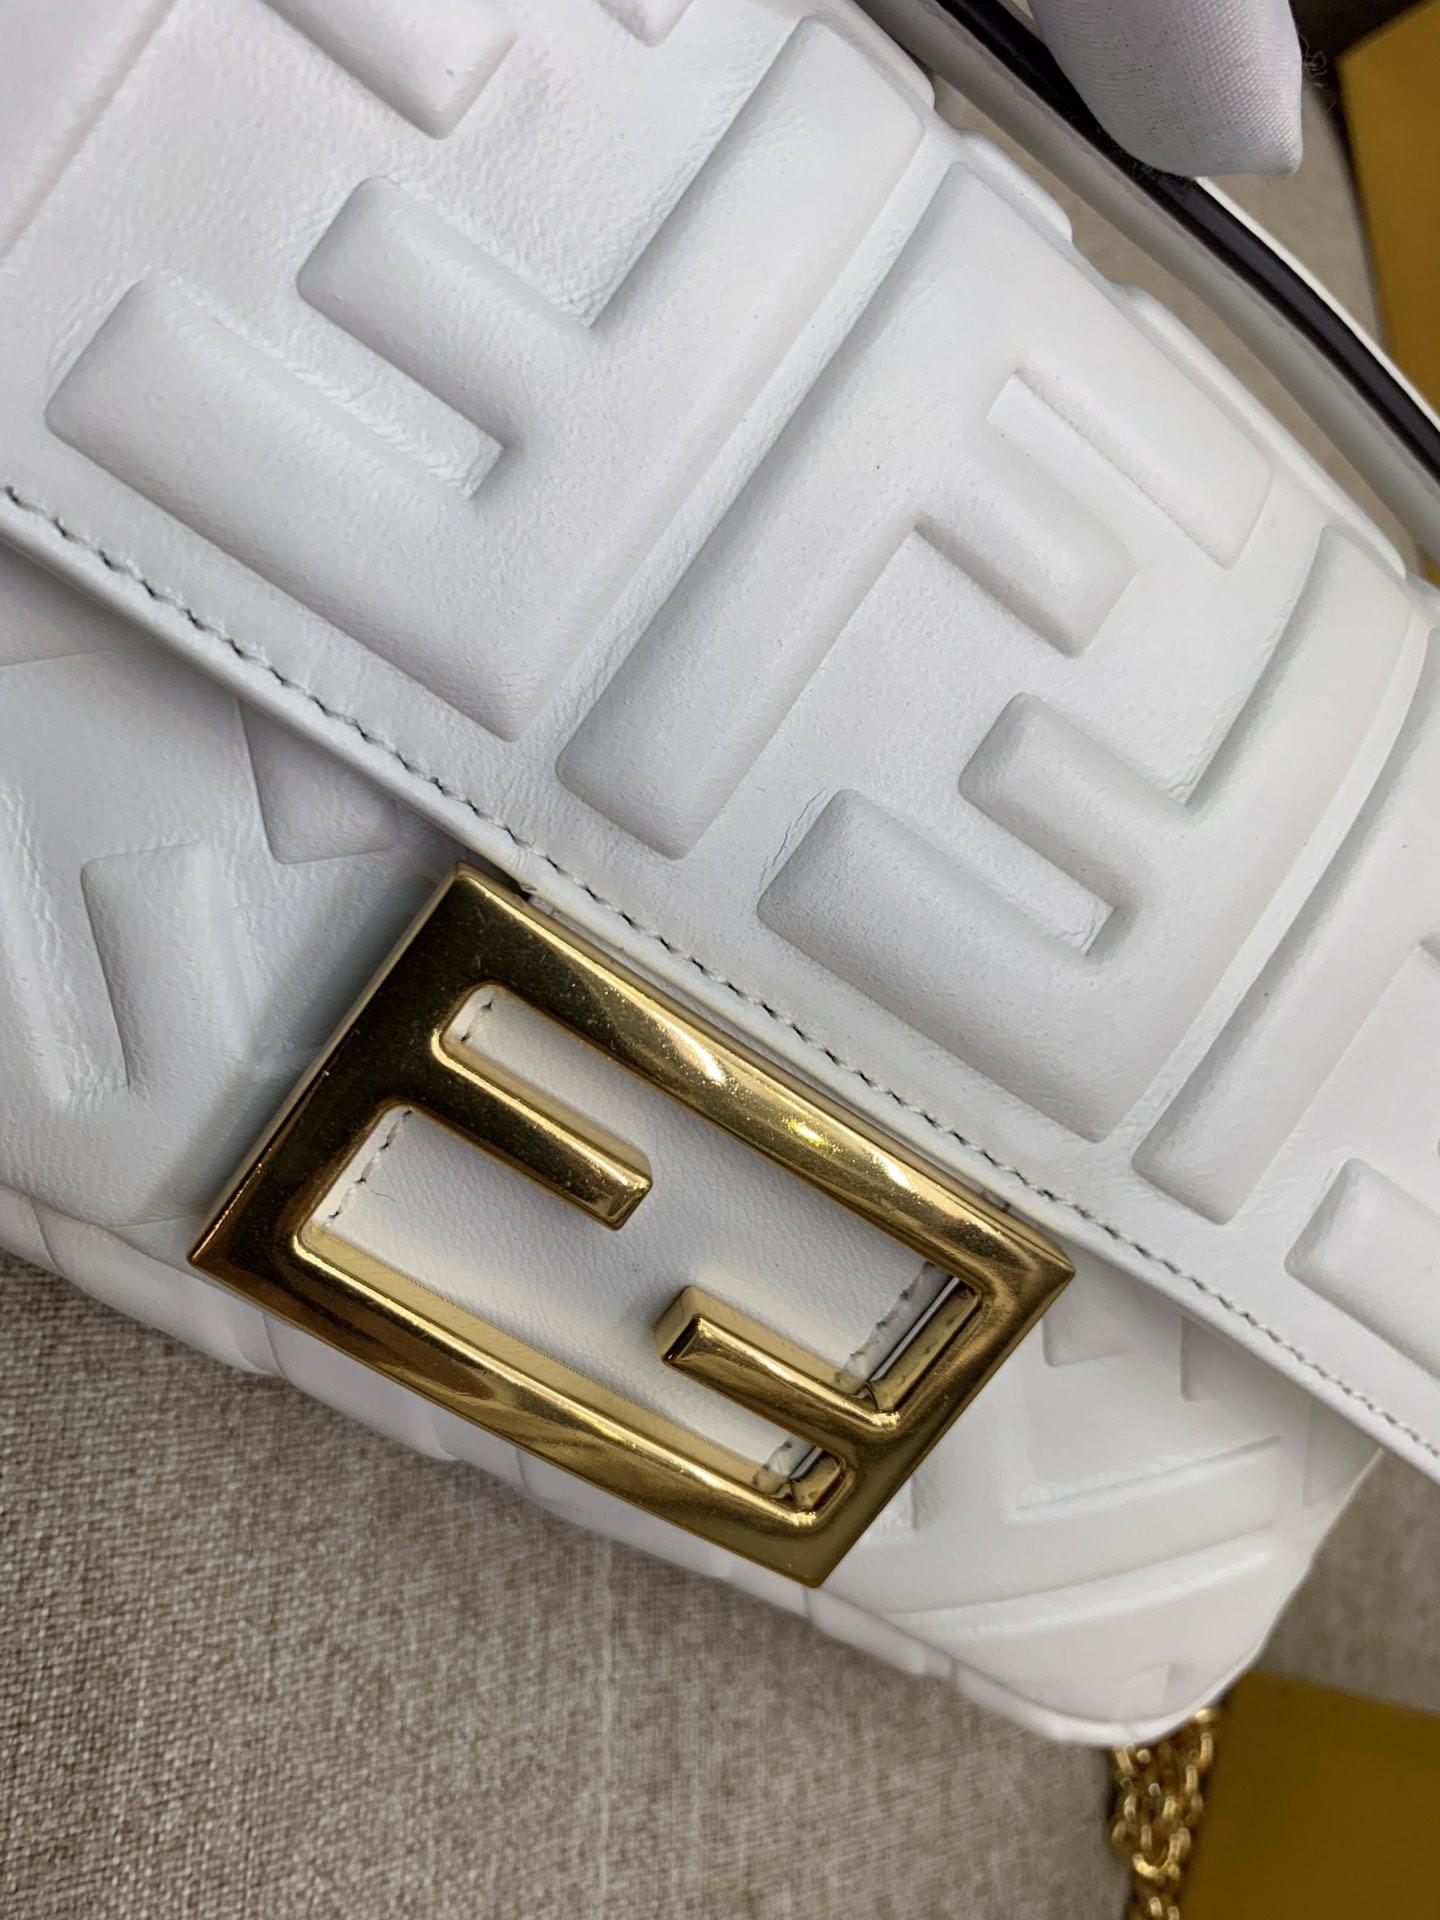 Fendi 芬迪 小号19cm Baguette 经典包款 FF凸纹 白色